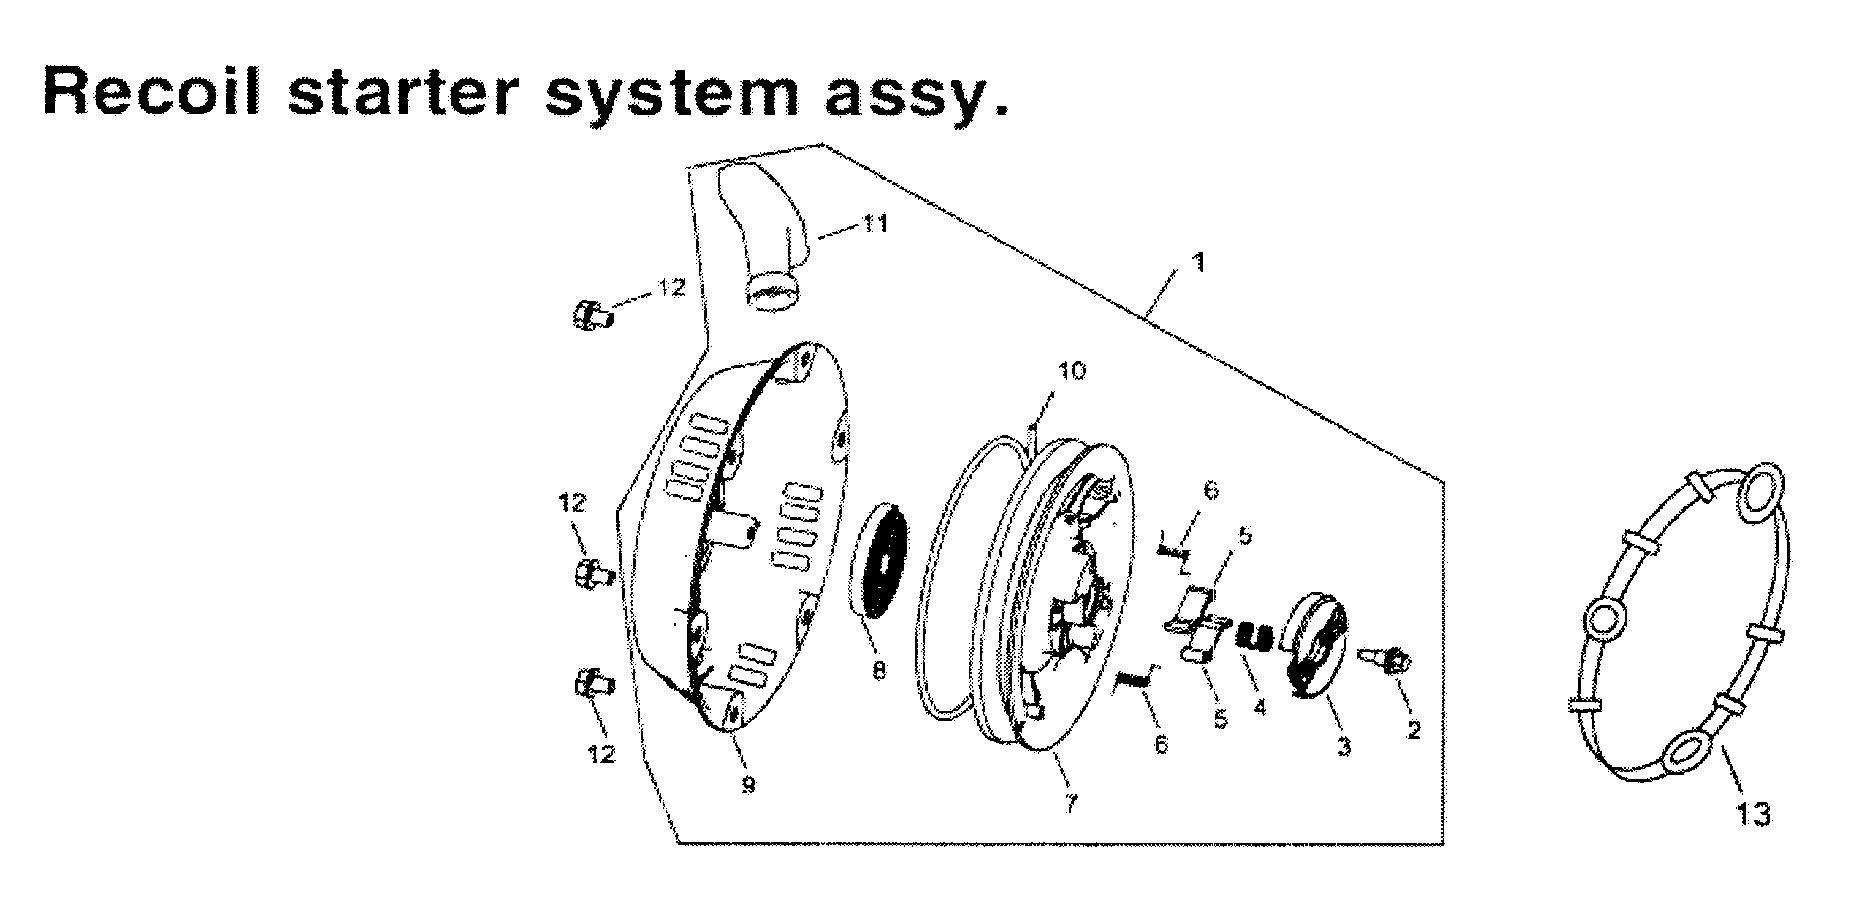 Gentron model GG3500 generator genuine parts